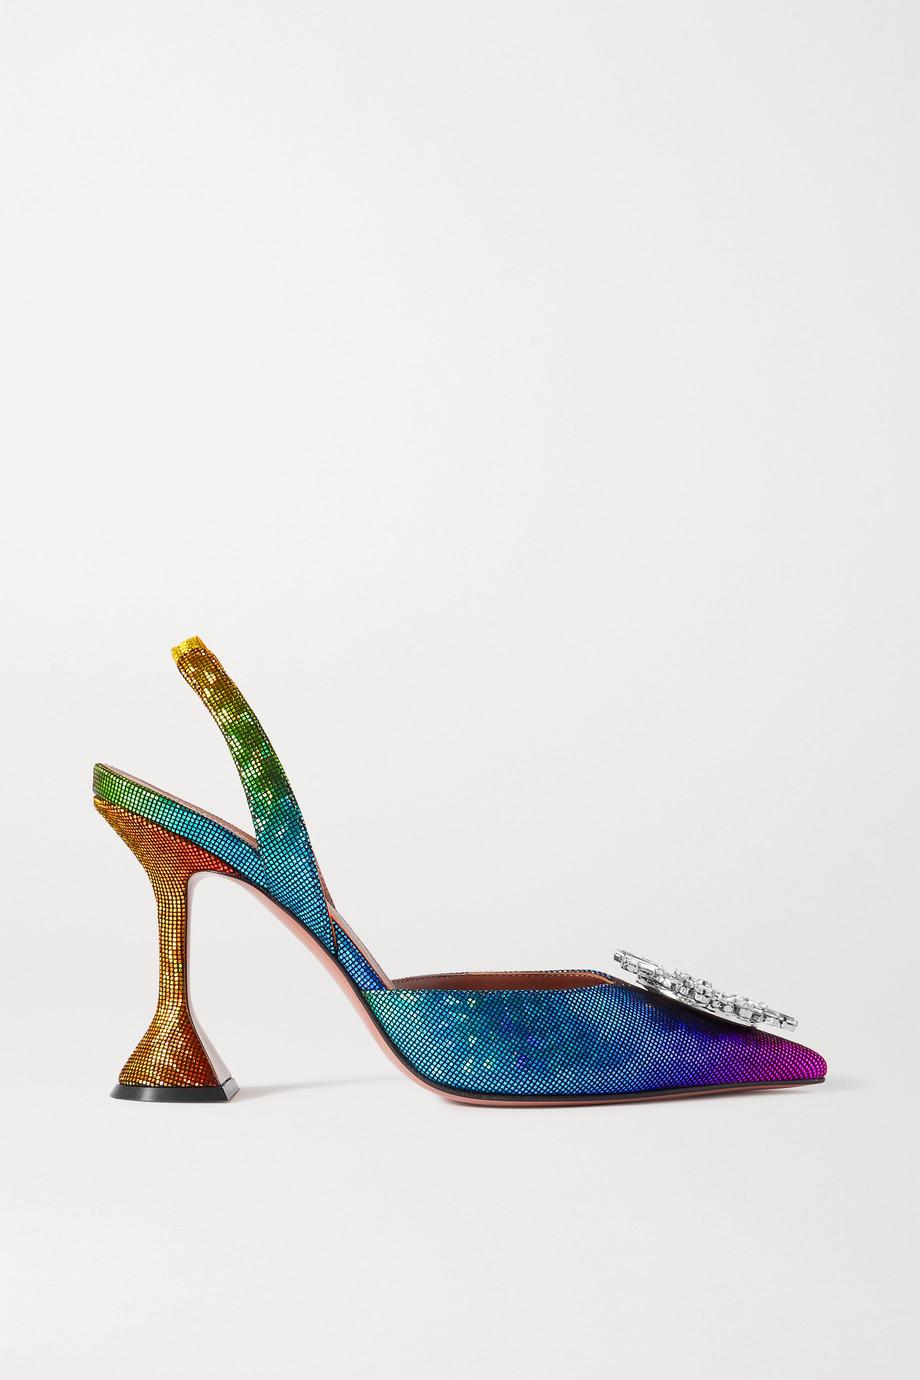 Amina Muaddi Begum 施华洛世奇水晶缀饰金属丝面料露跟高跟鞋